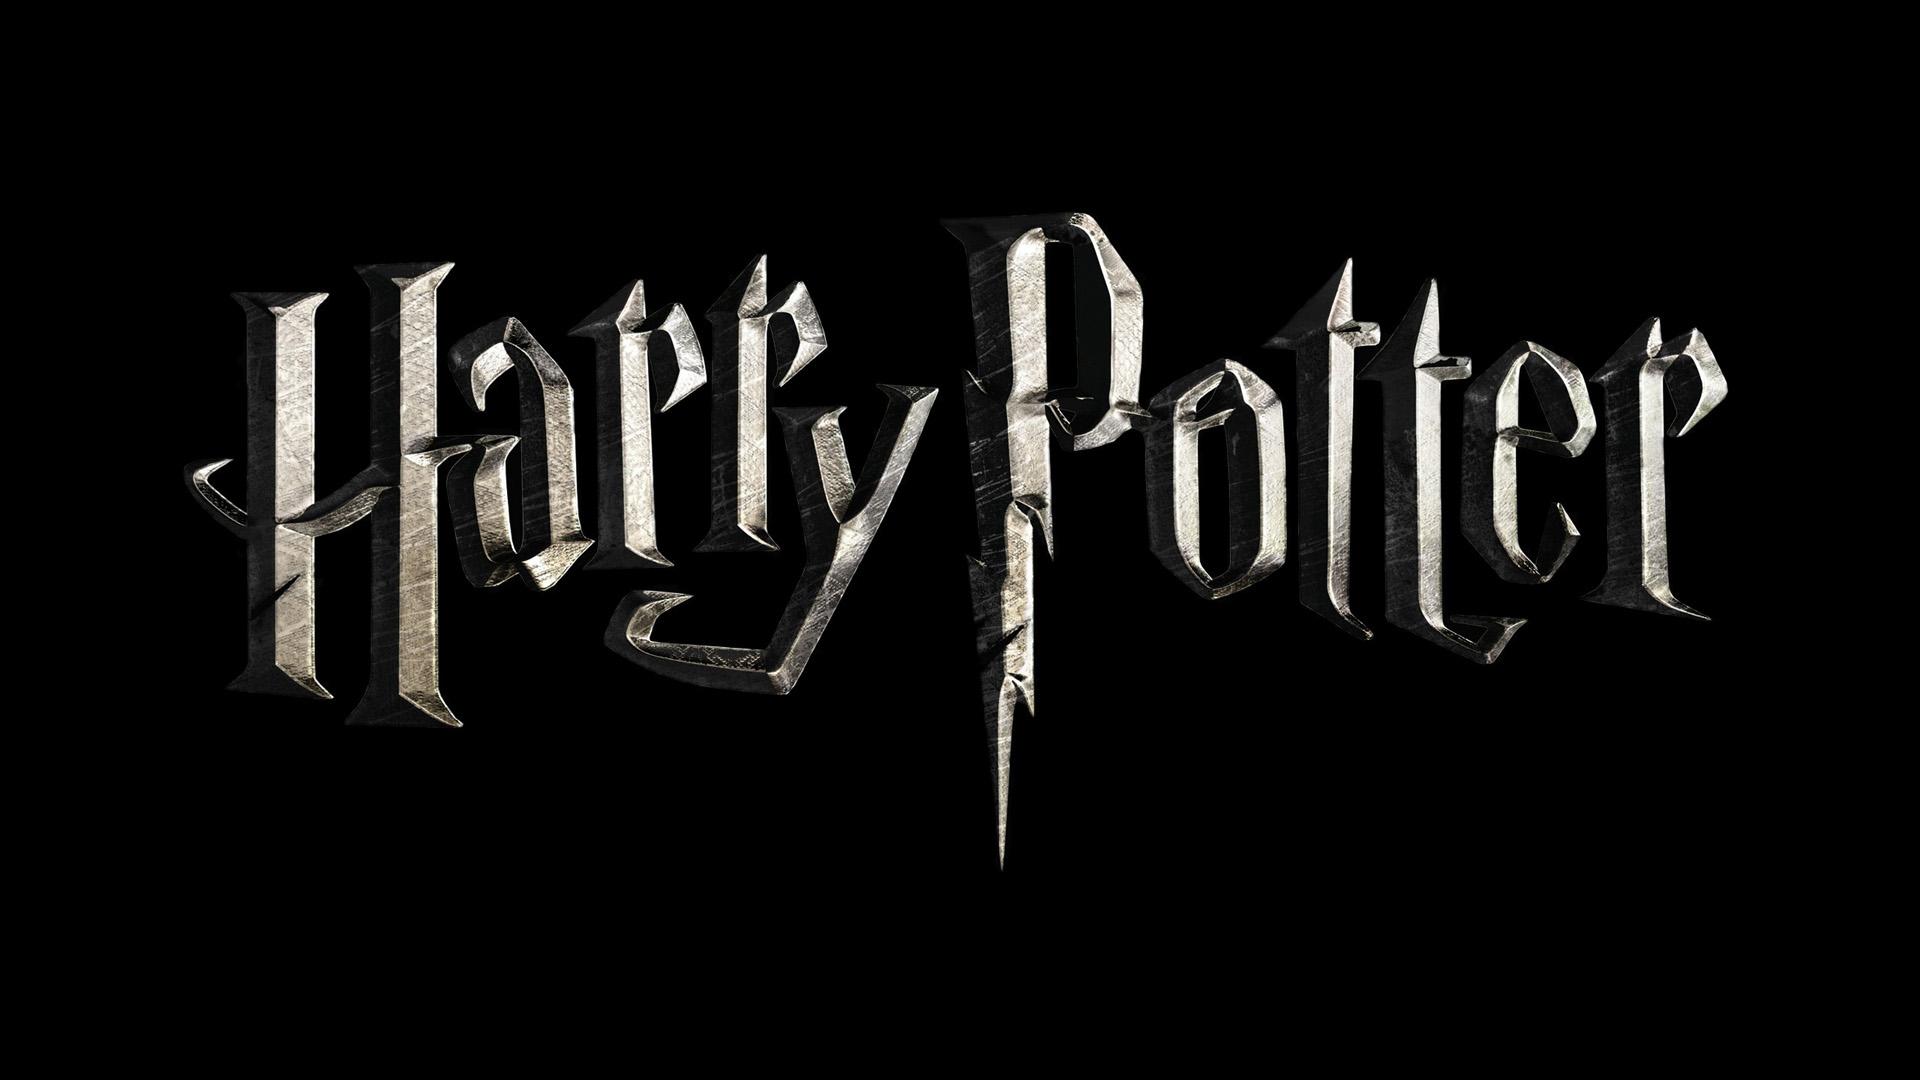 Veritas Sagas De Cine Harry Potter Segunda Parte